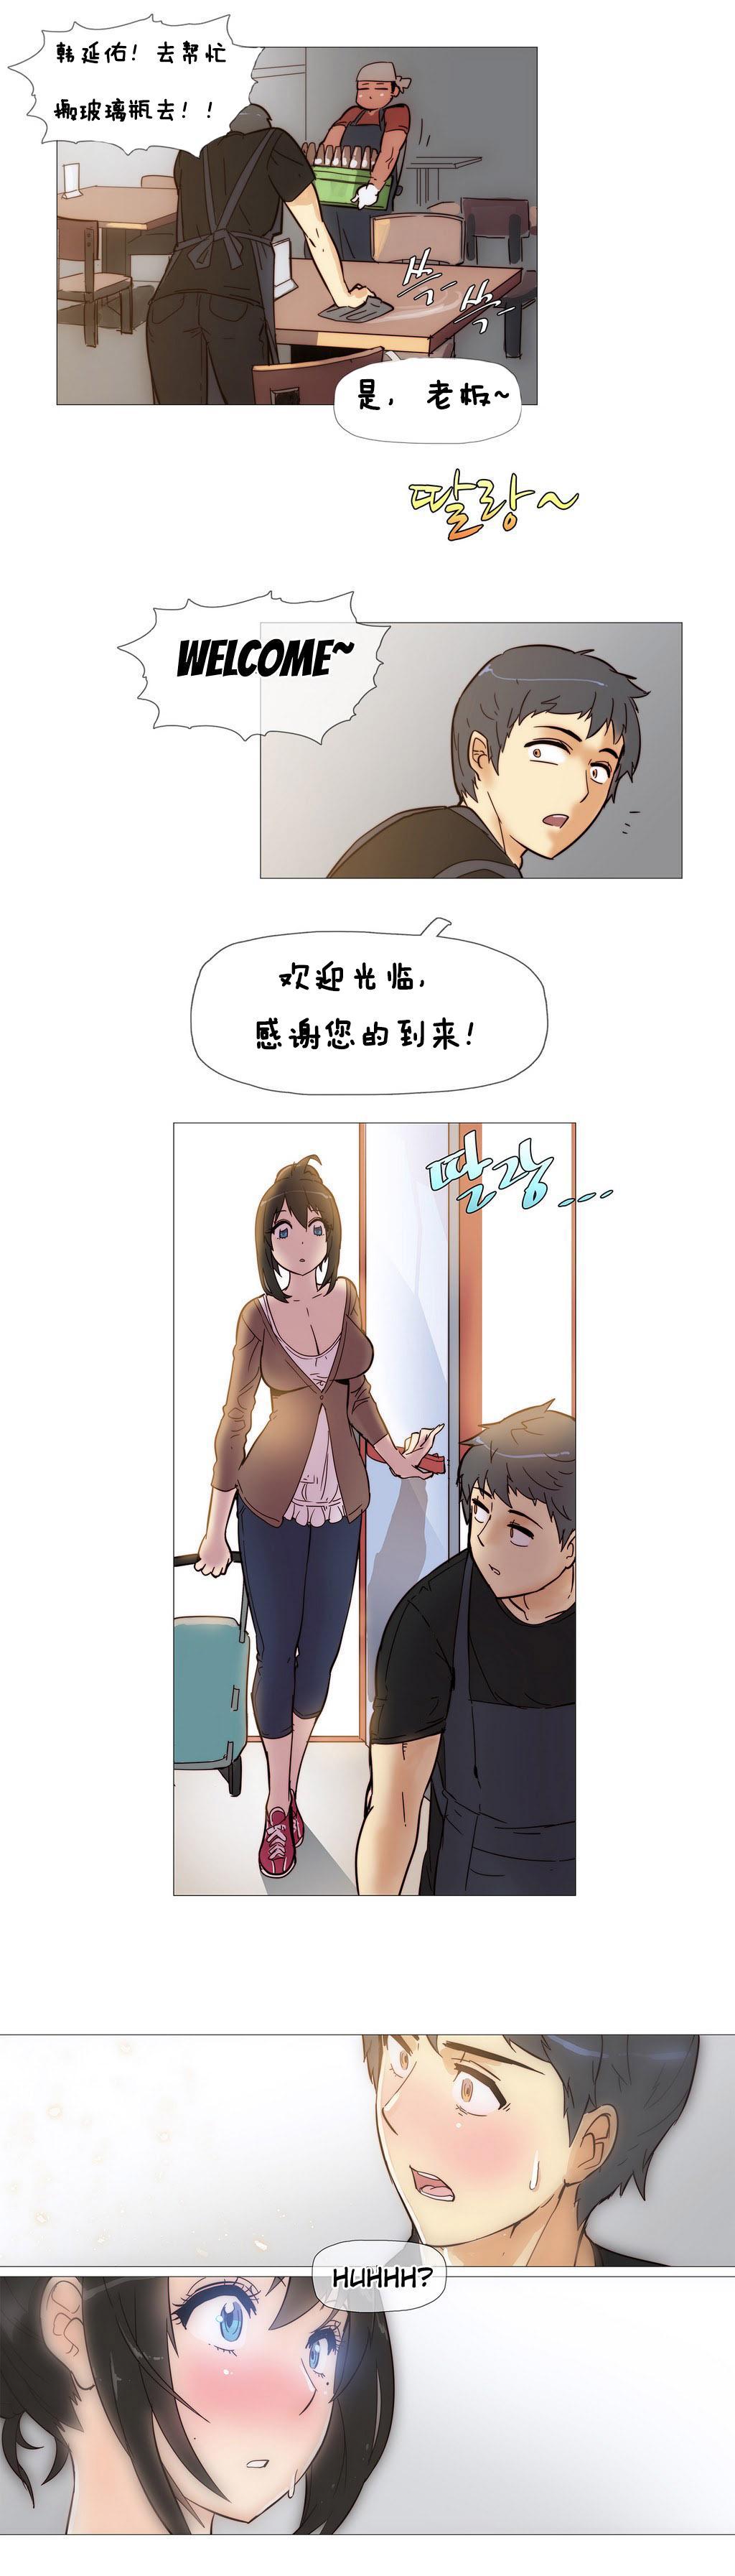 HouseHold Affairs 【卞赤鲤个人汉化】1~21话(持续更新中) 63